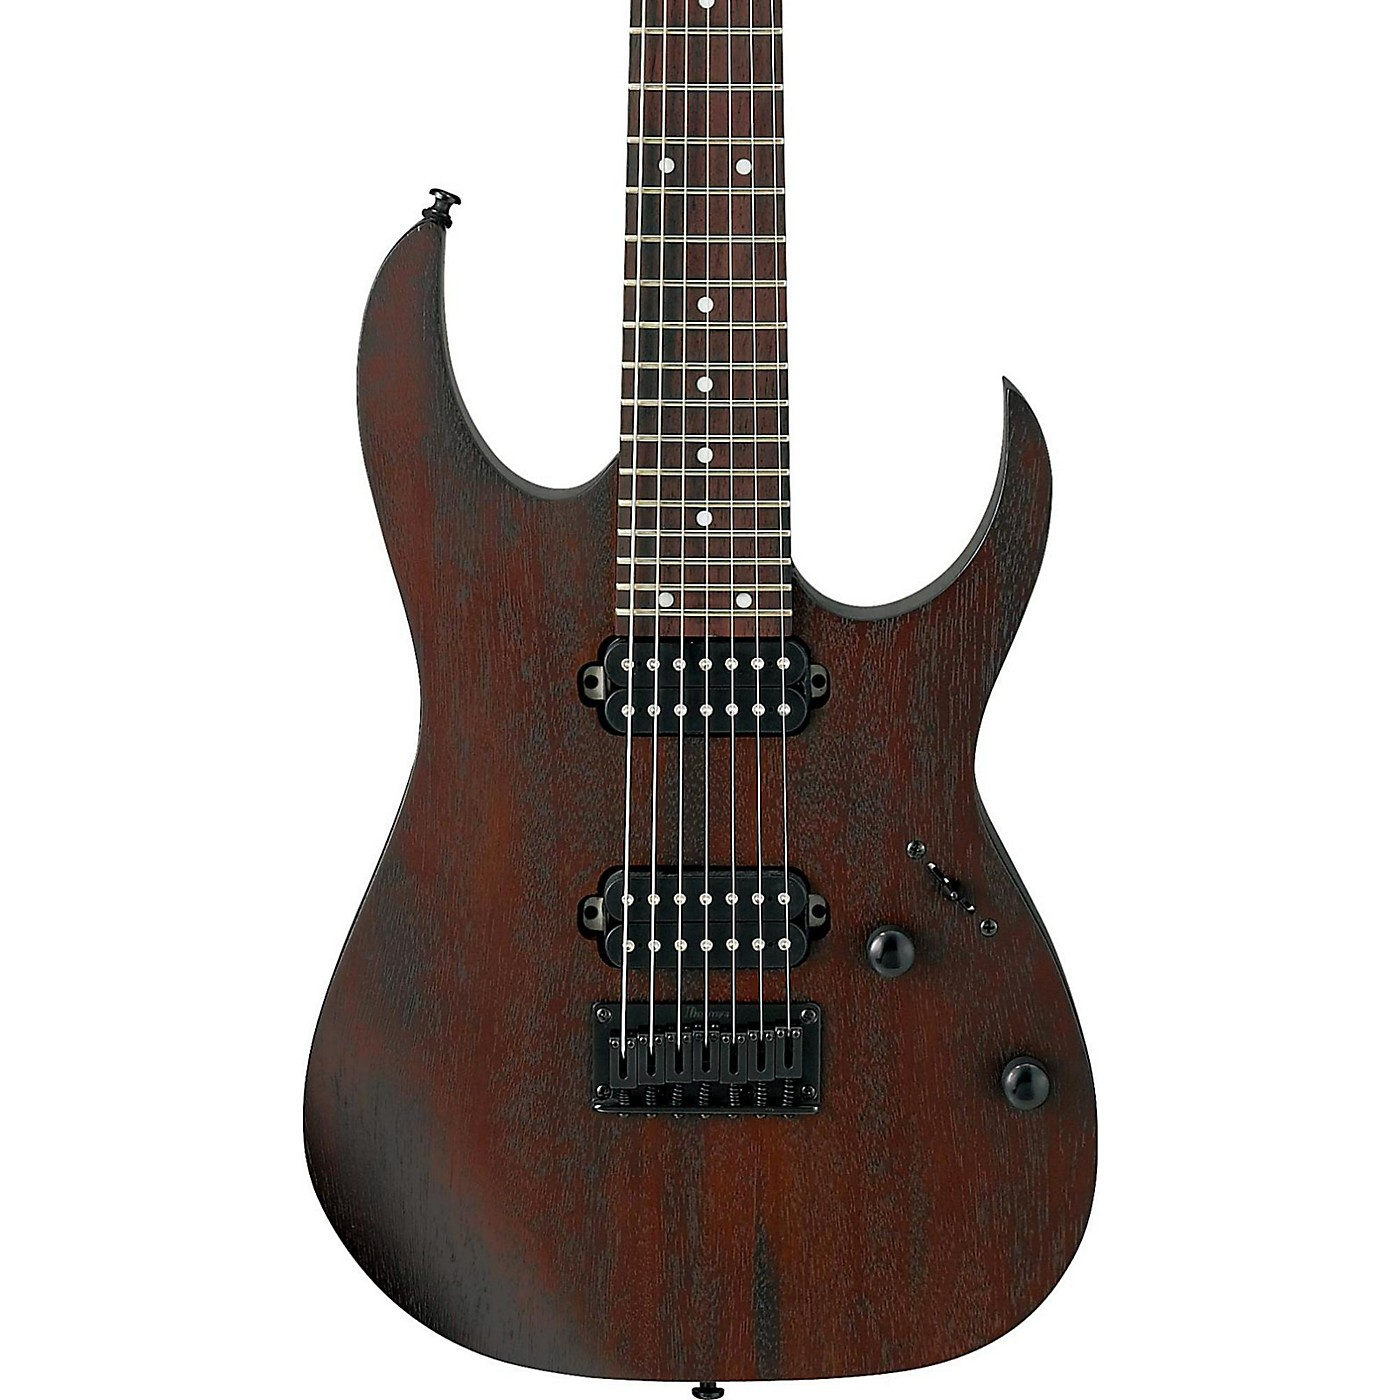 Ibanez RG Series RG7421 Fixed Bridge 7-String Electric Guitar thumbnail